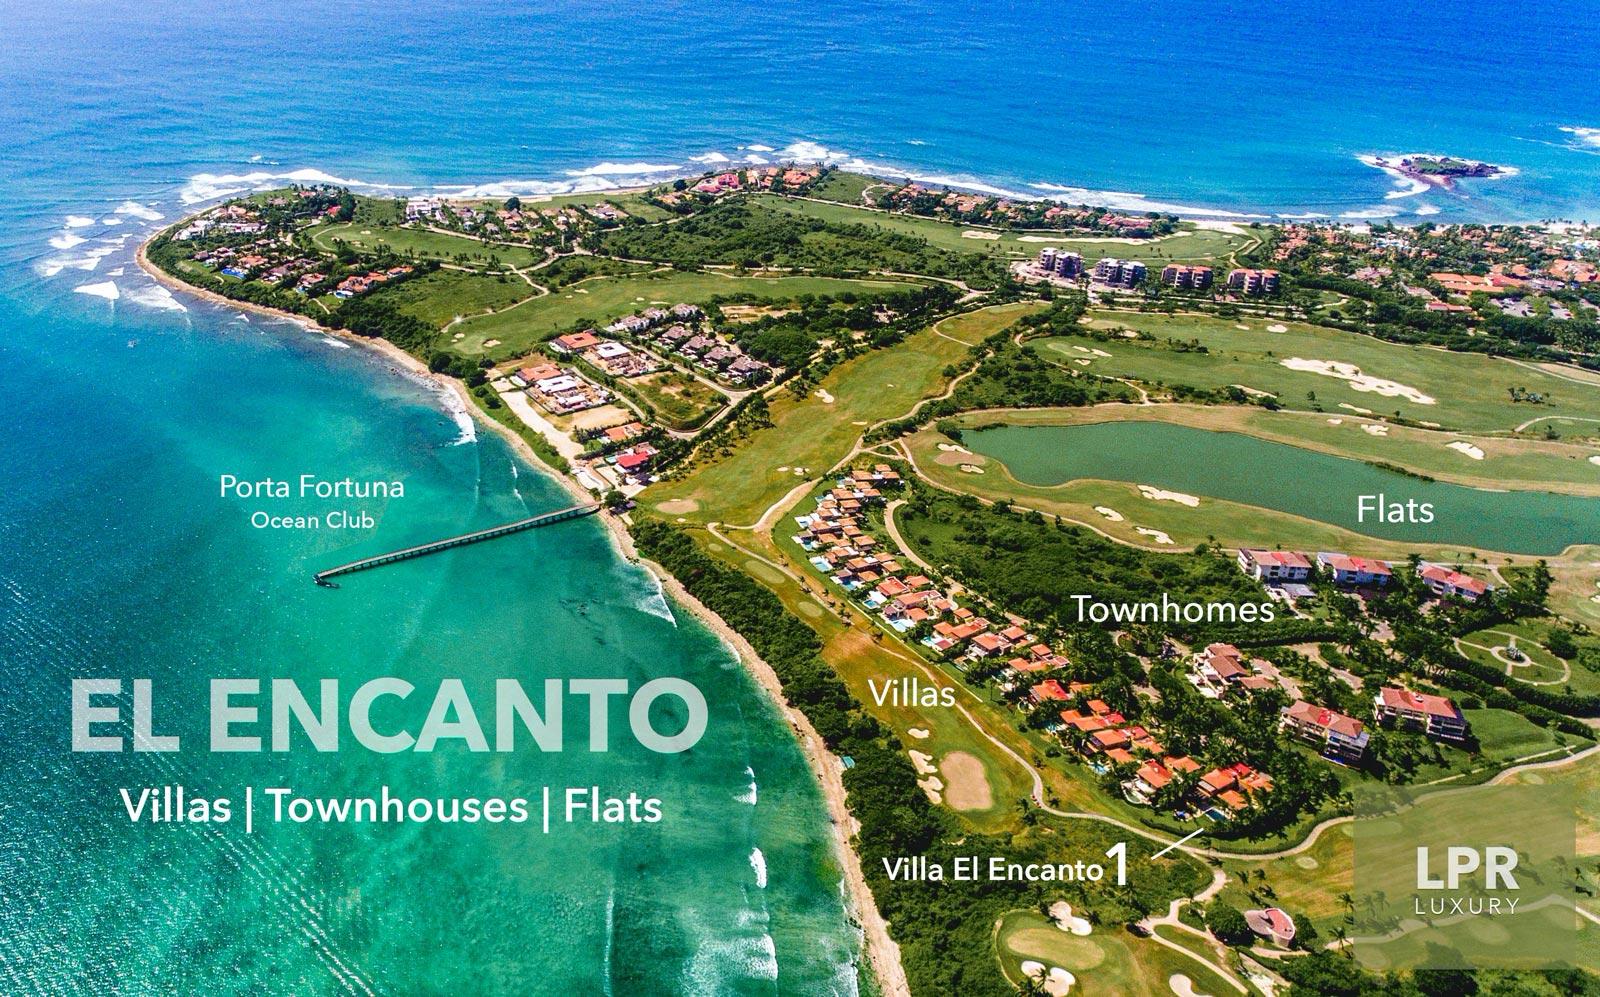 Villa El Encanto 1 - Luxury vacation rental resort real estate on the Jack Nicklaus golf course at the Four Seasons / St. Regis - Punta Mita Resort, Riviera Nayarit, Mexico